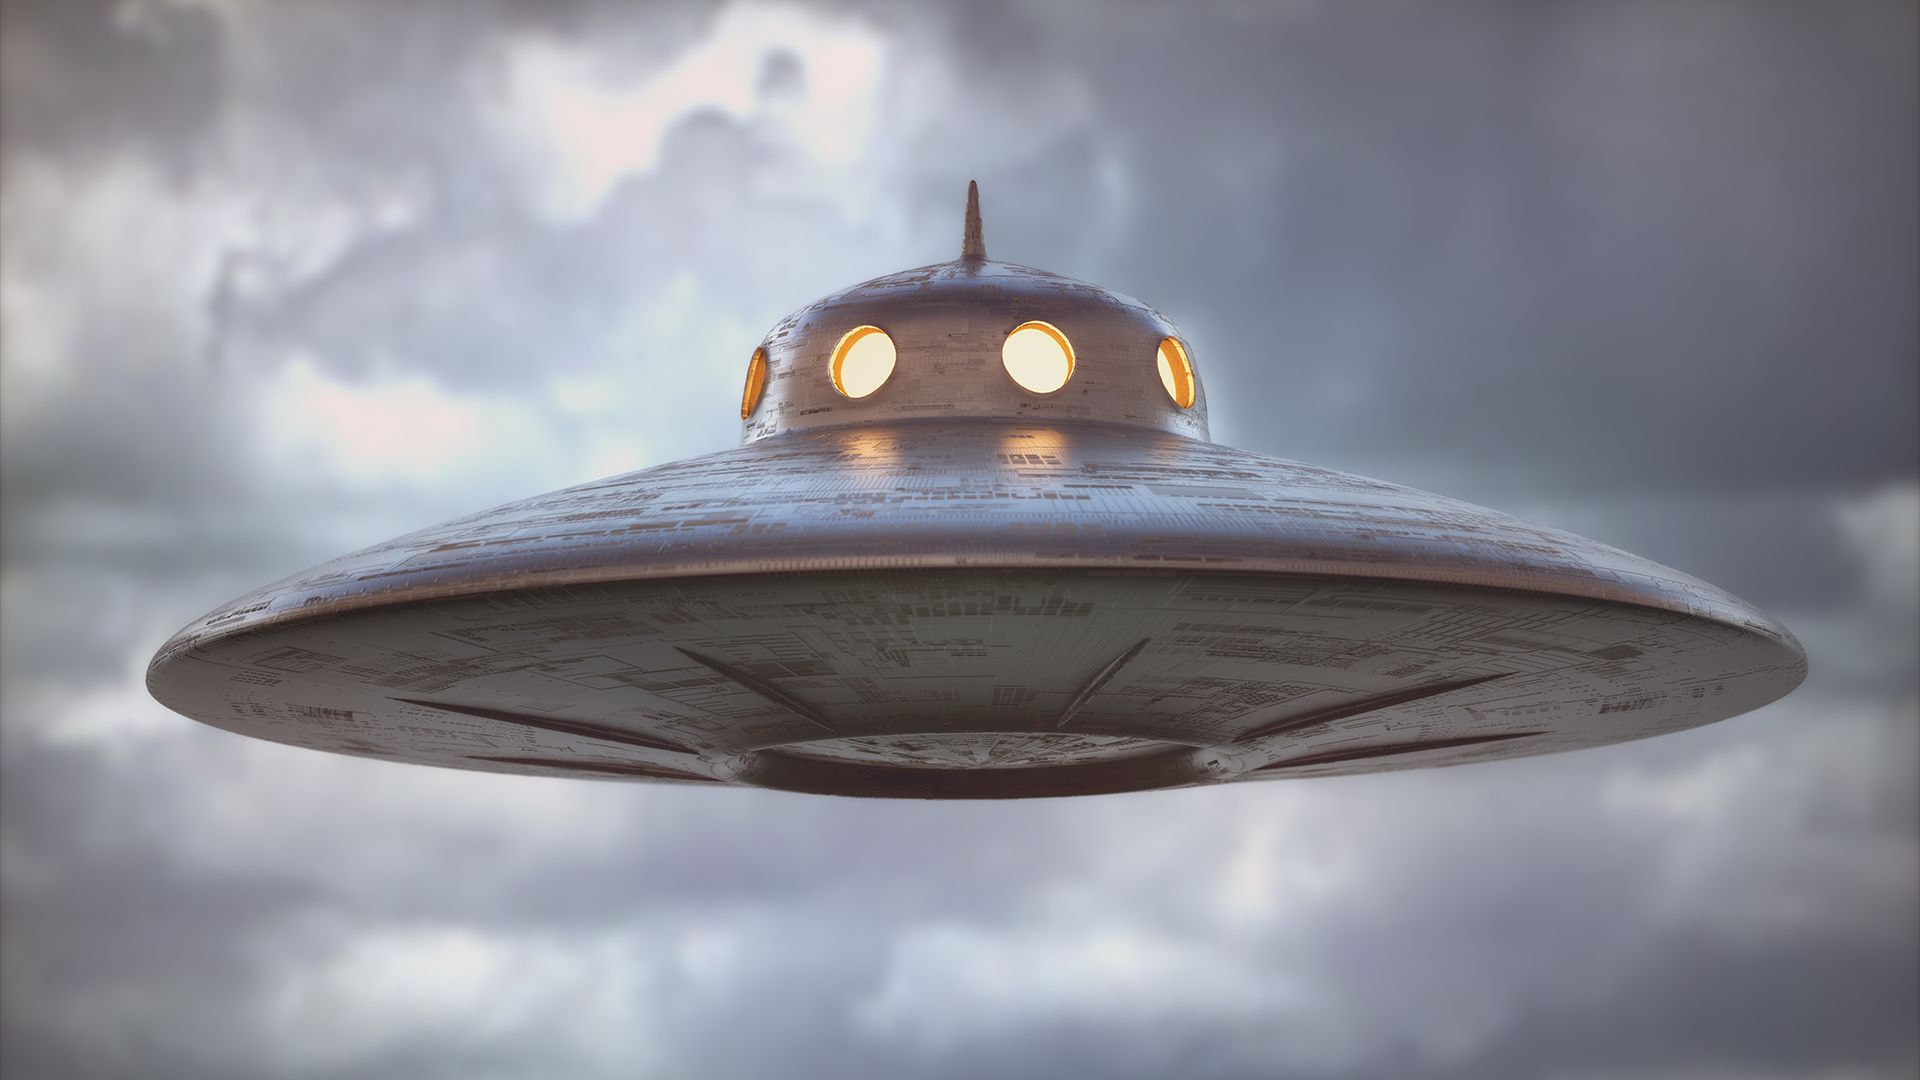 ufo otthon pikkelysömörrel)